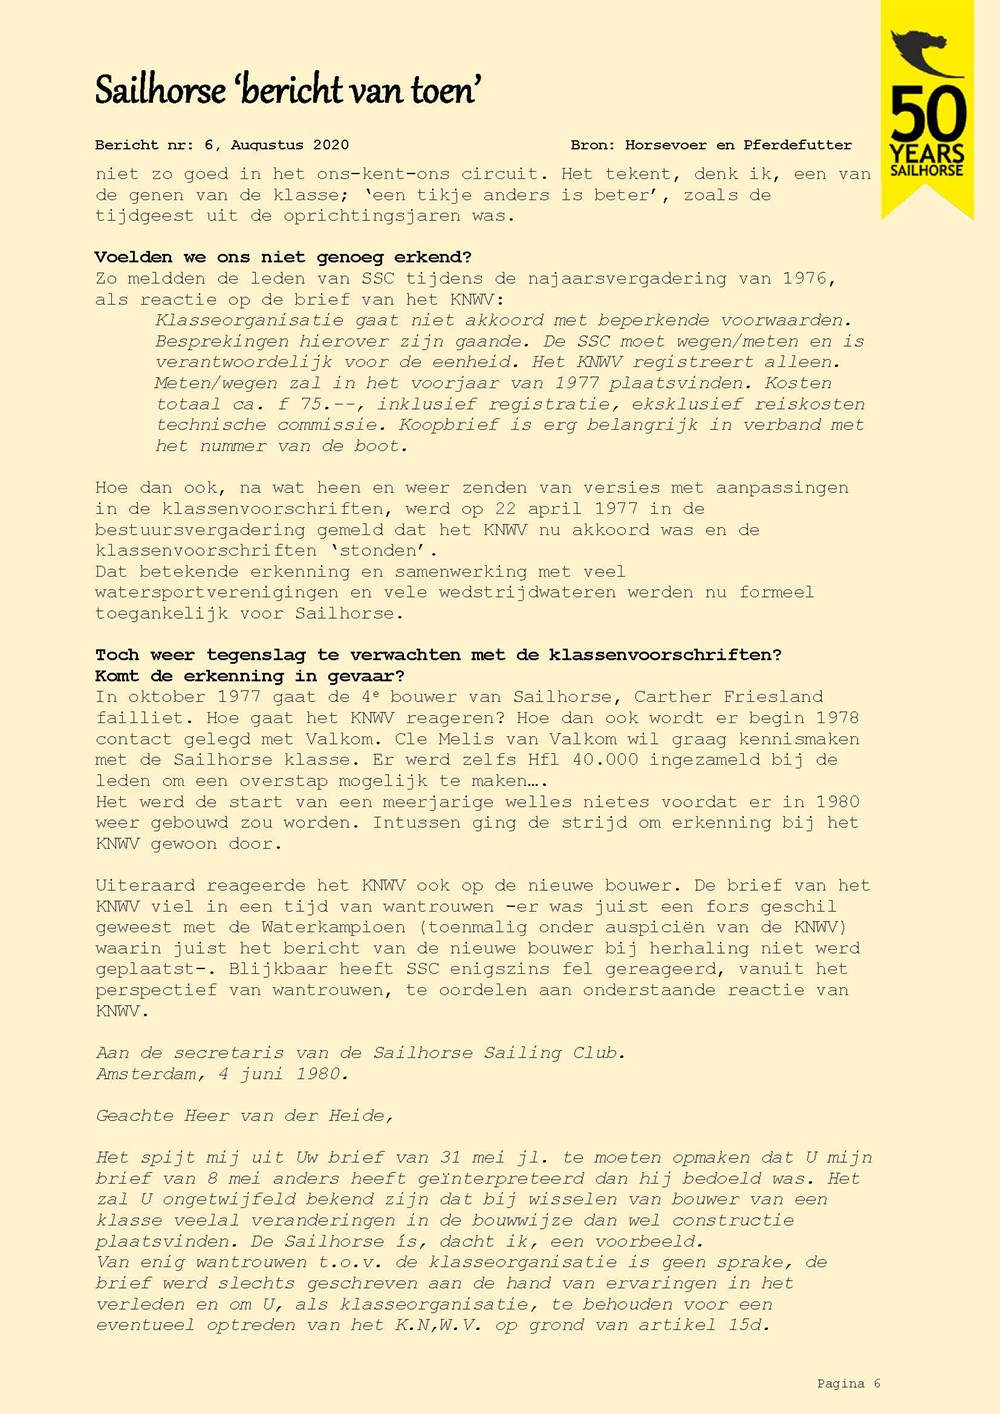 BvT06_3_Page_06.jpg